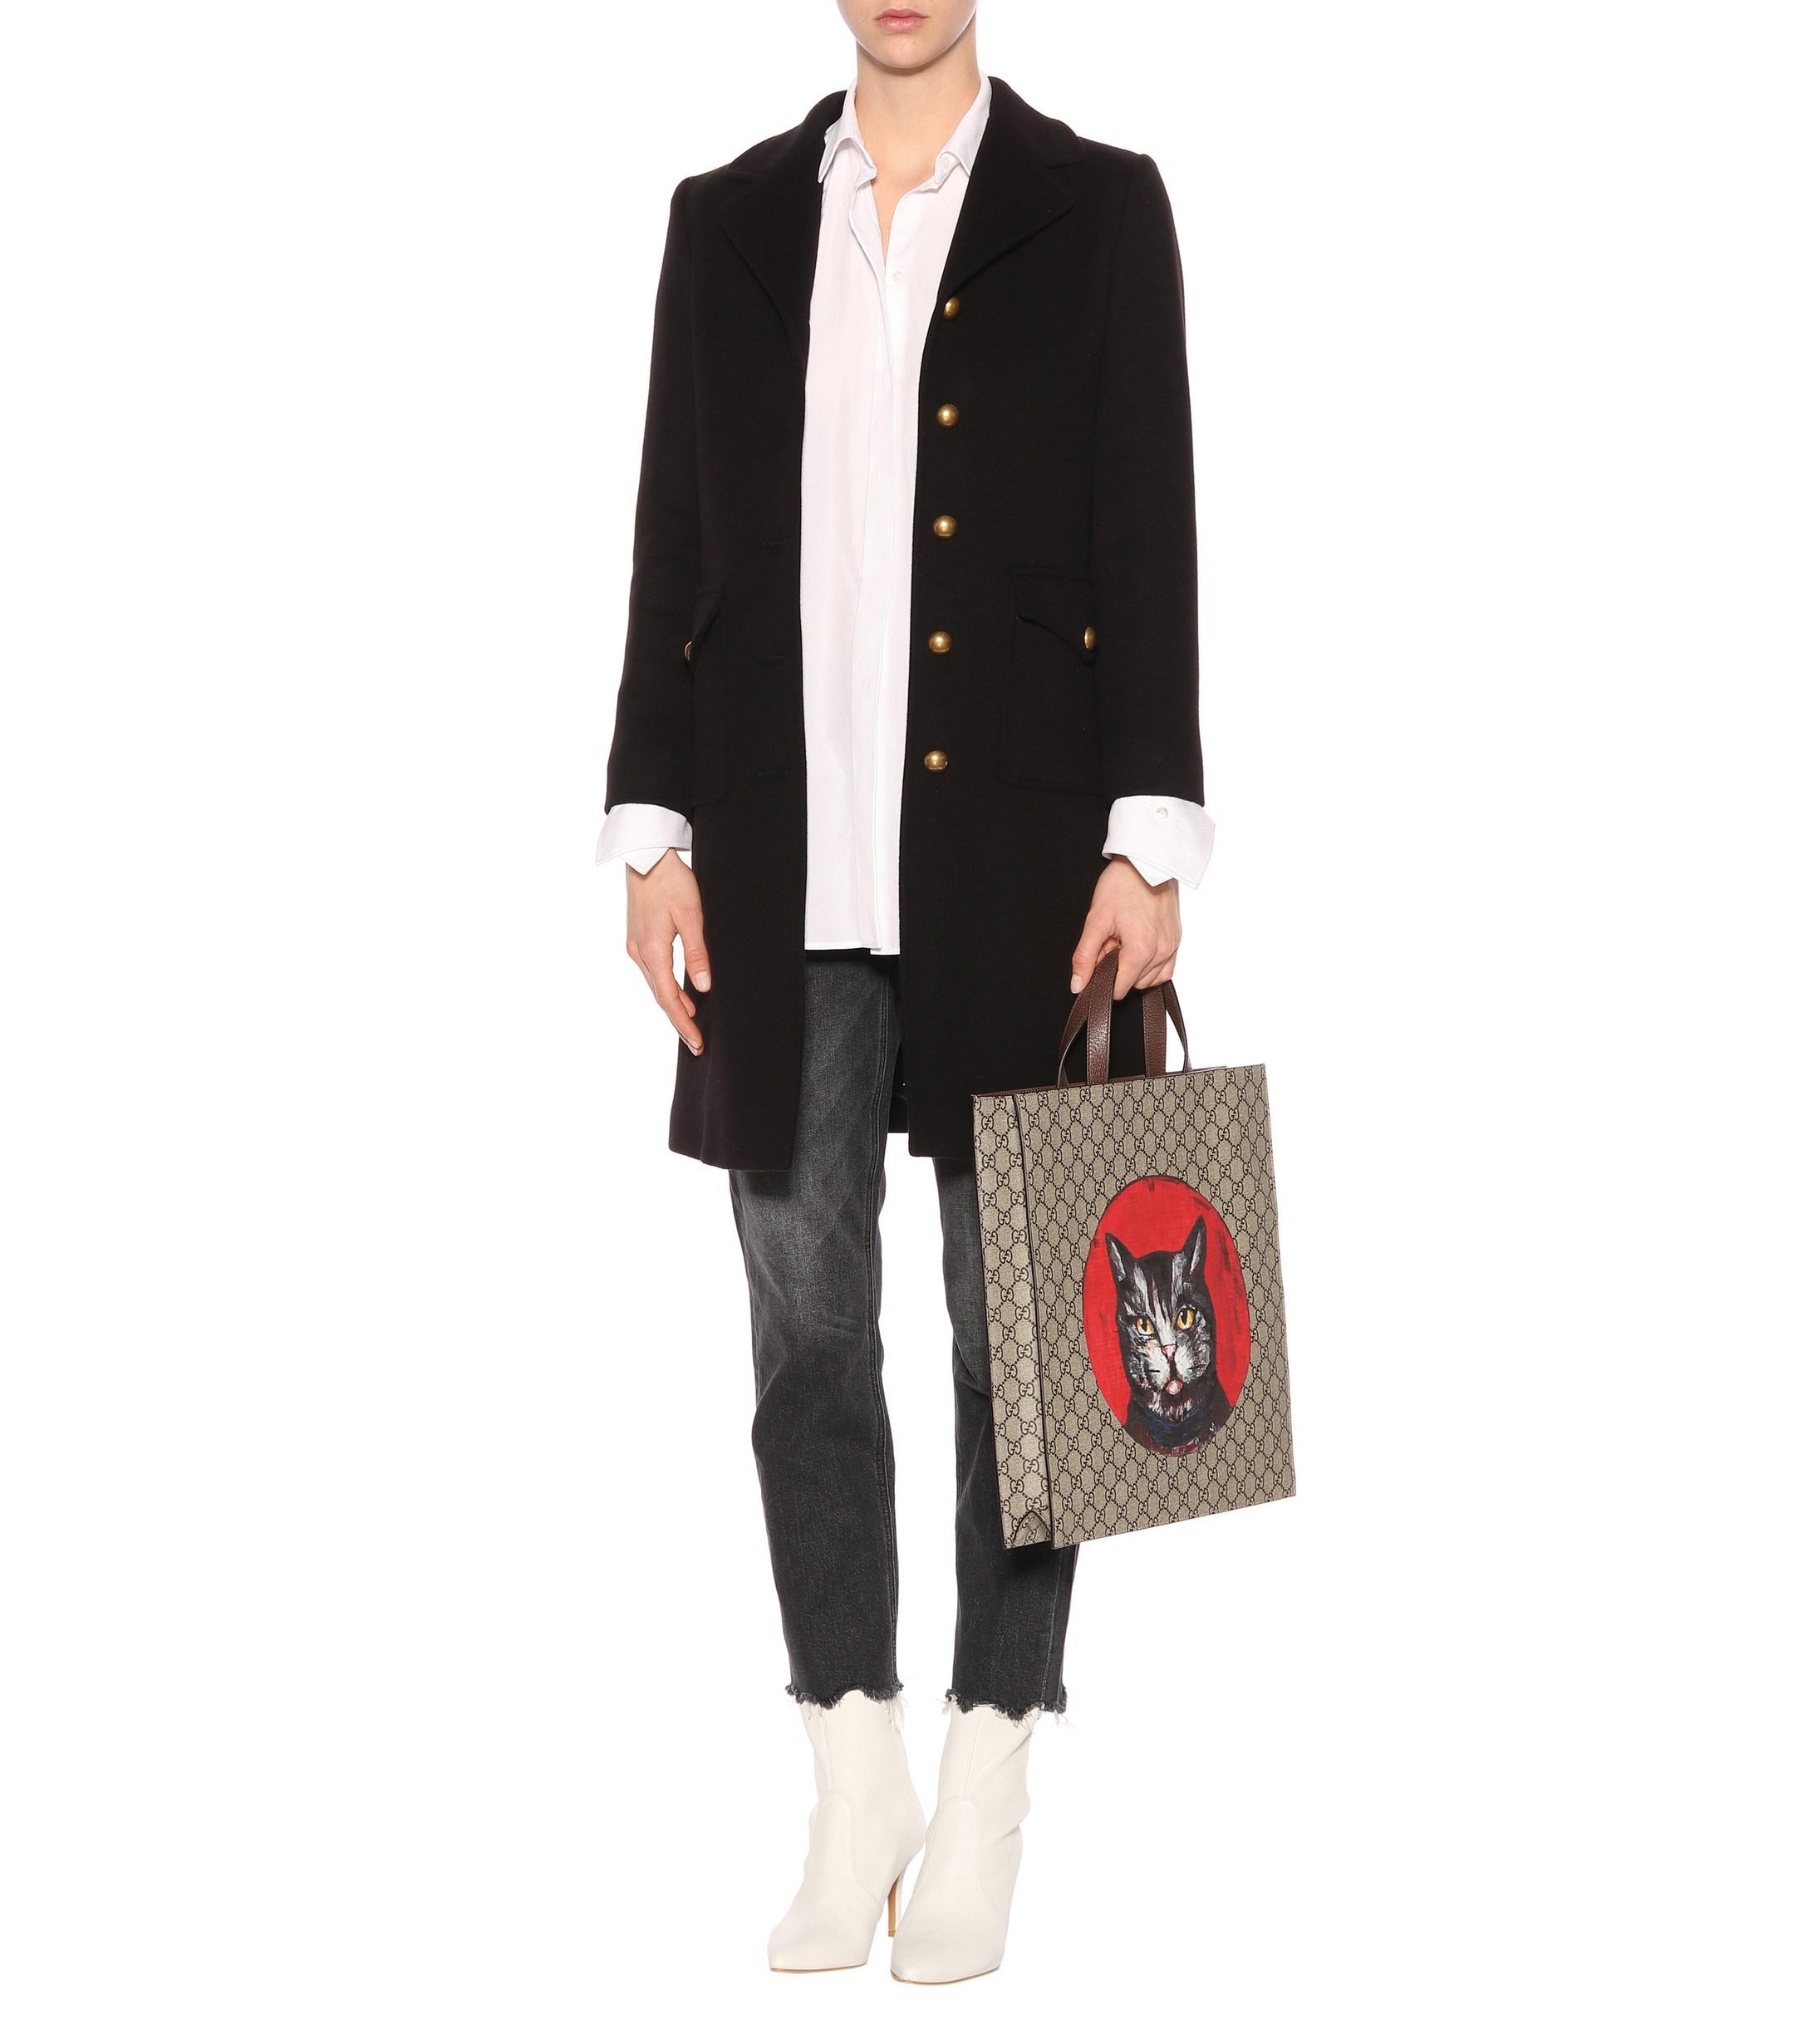 289c62523f5 Gucci - Black Double G Wool Coat - Lyst. View fullscreen